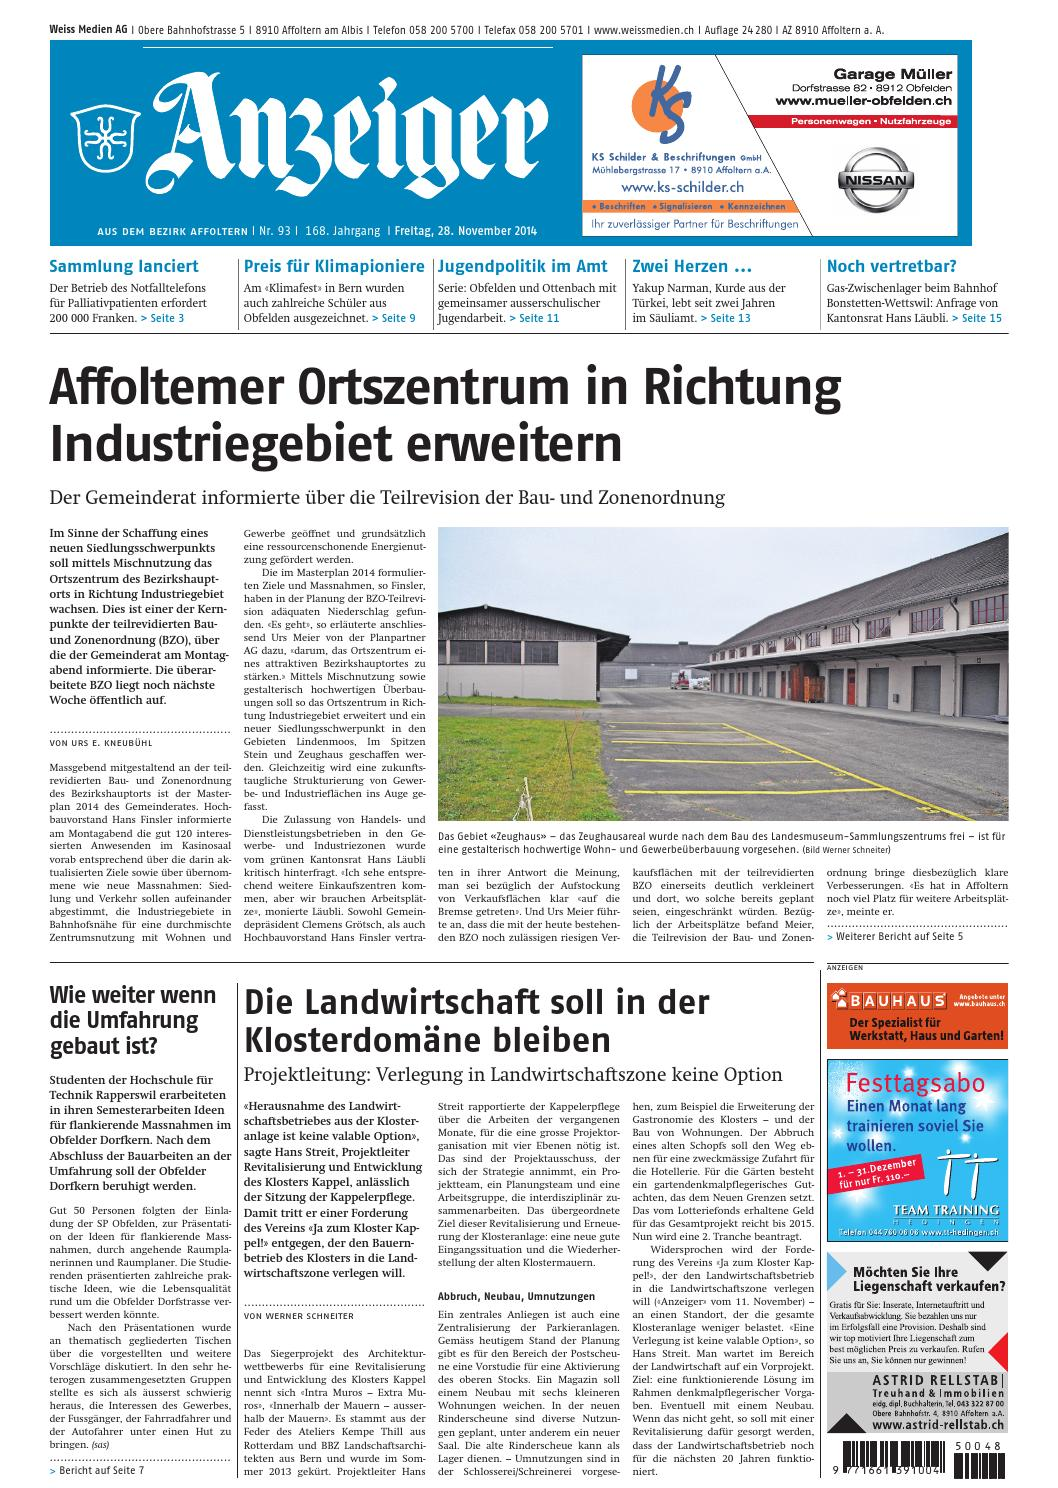 093 2014 by AZ-Anzeiger - issuu